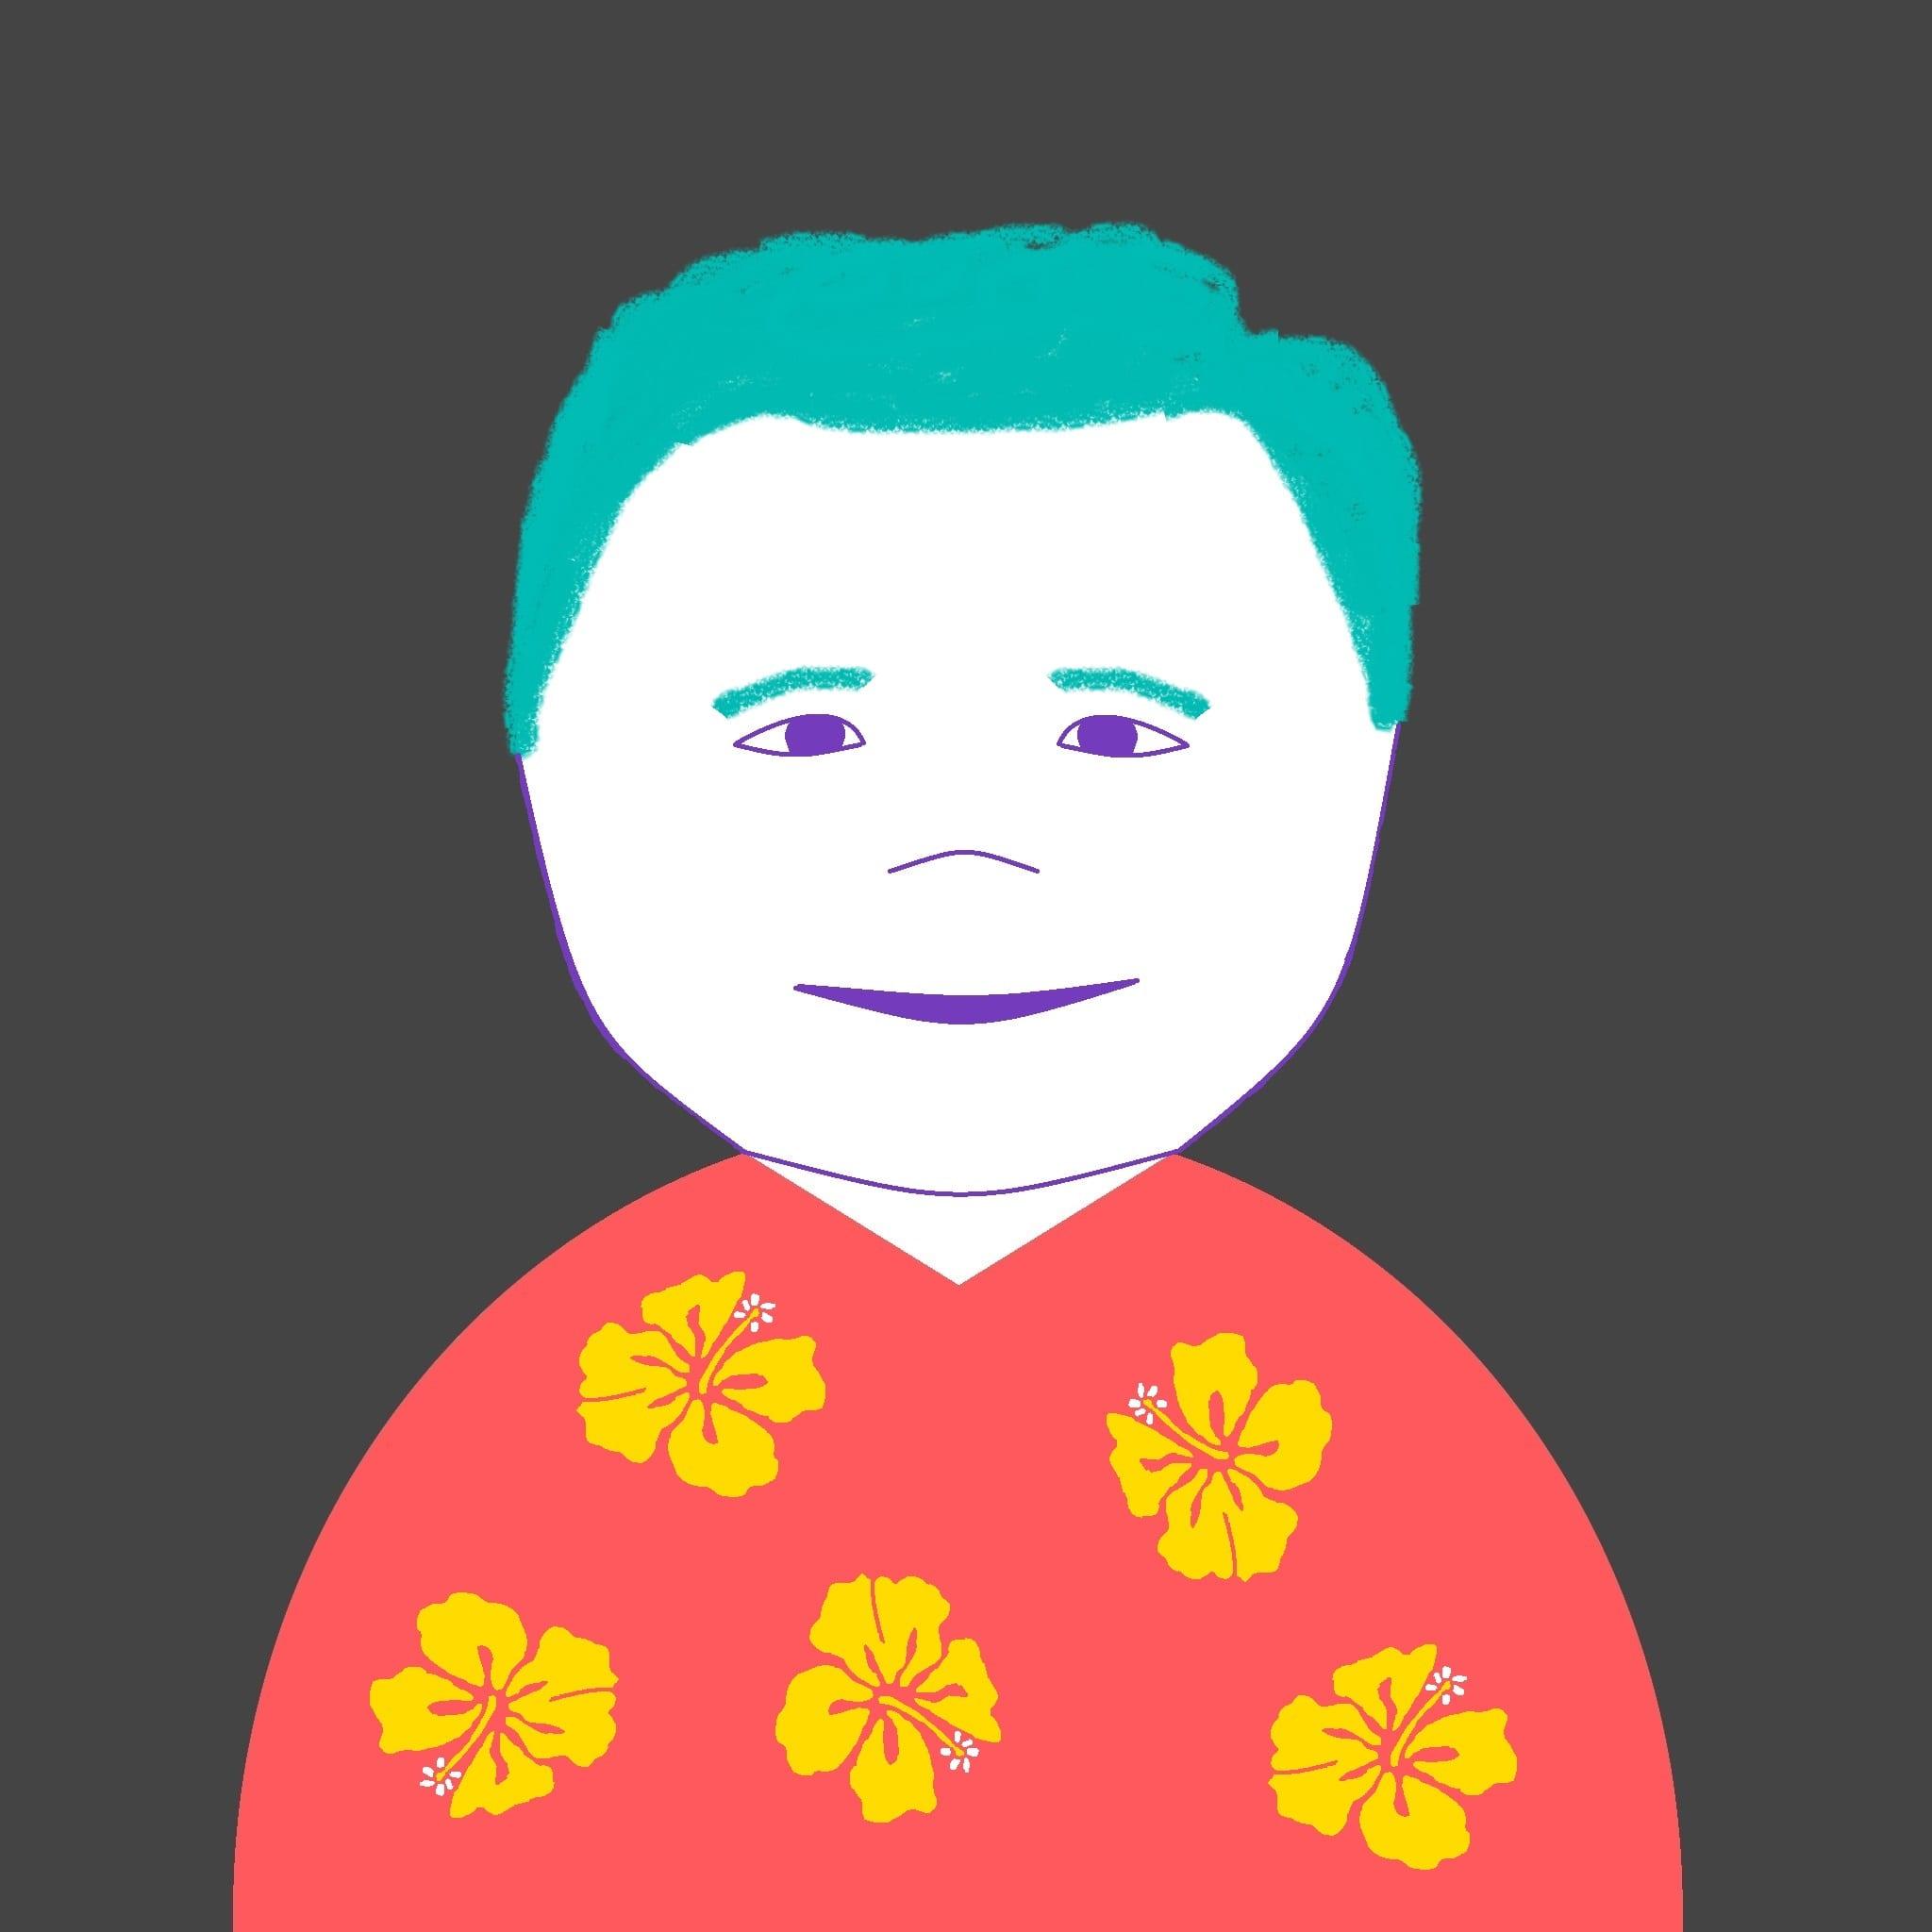 Dan Harrigan - Headshot Drawn